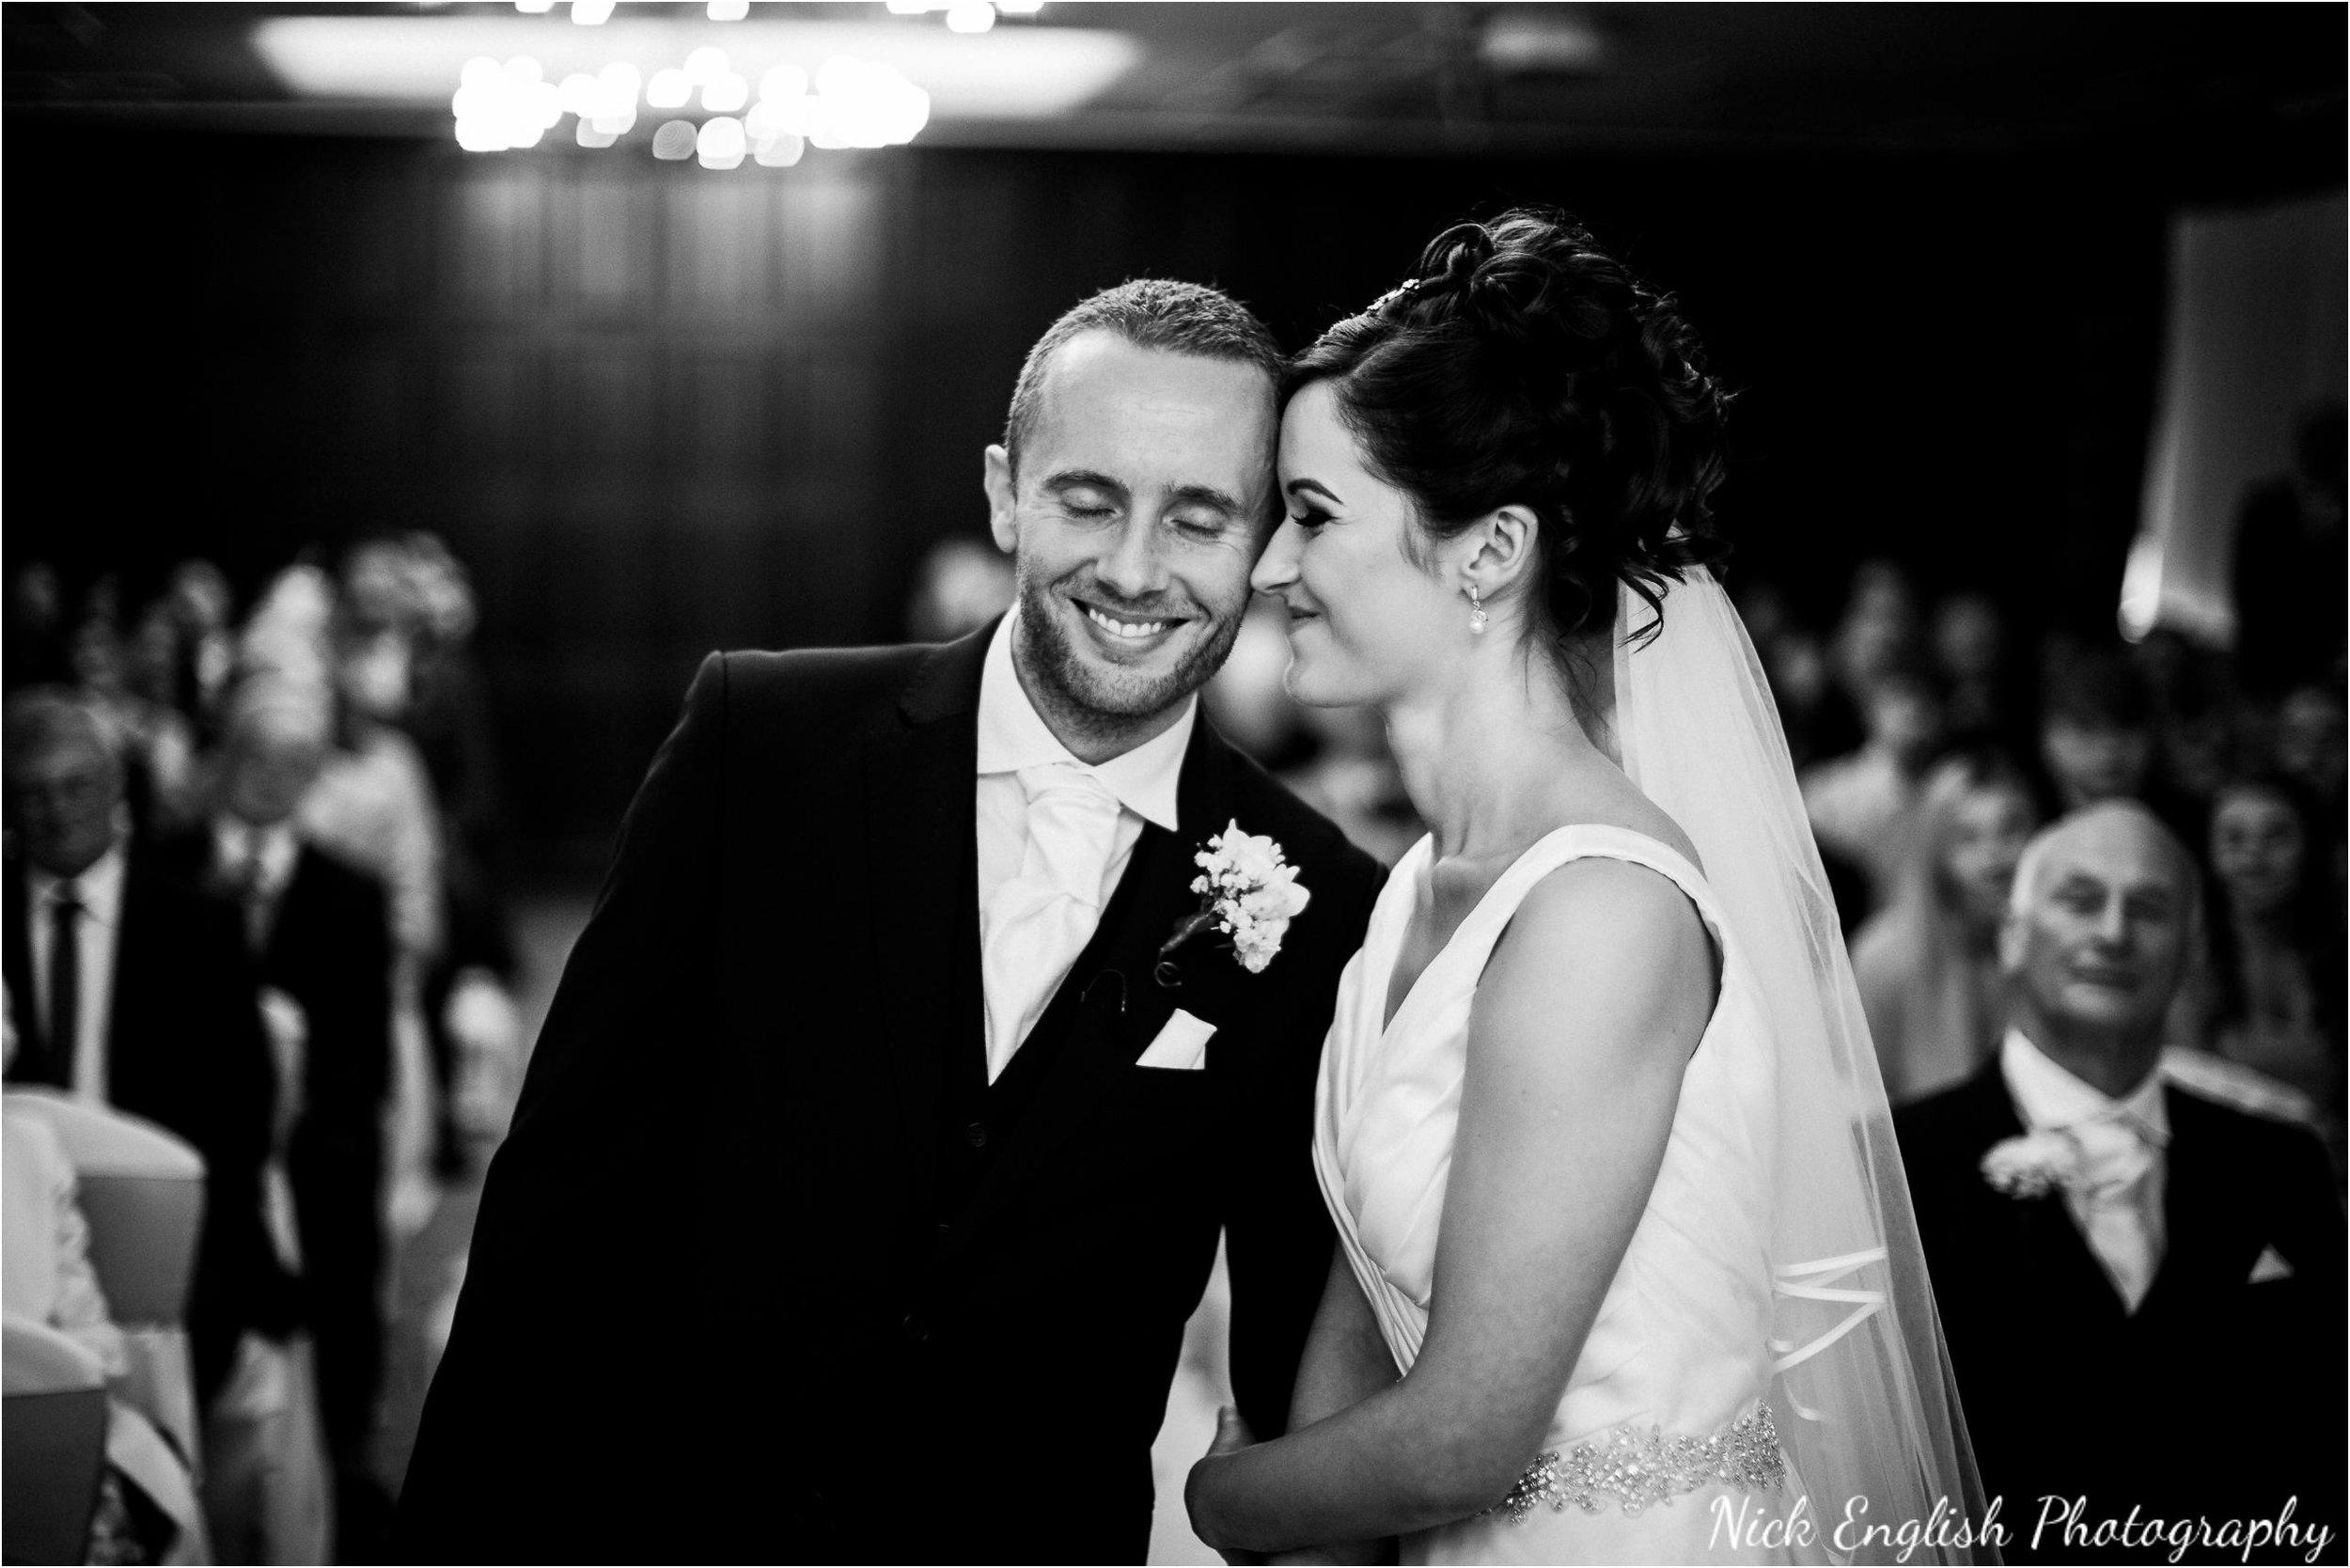 Emily David Wedding Photographs at Barton Grange Preston by Nick English Photography 77jpg.jpeg